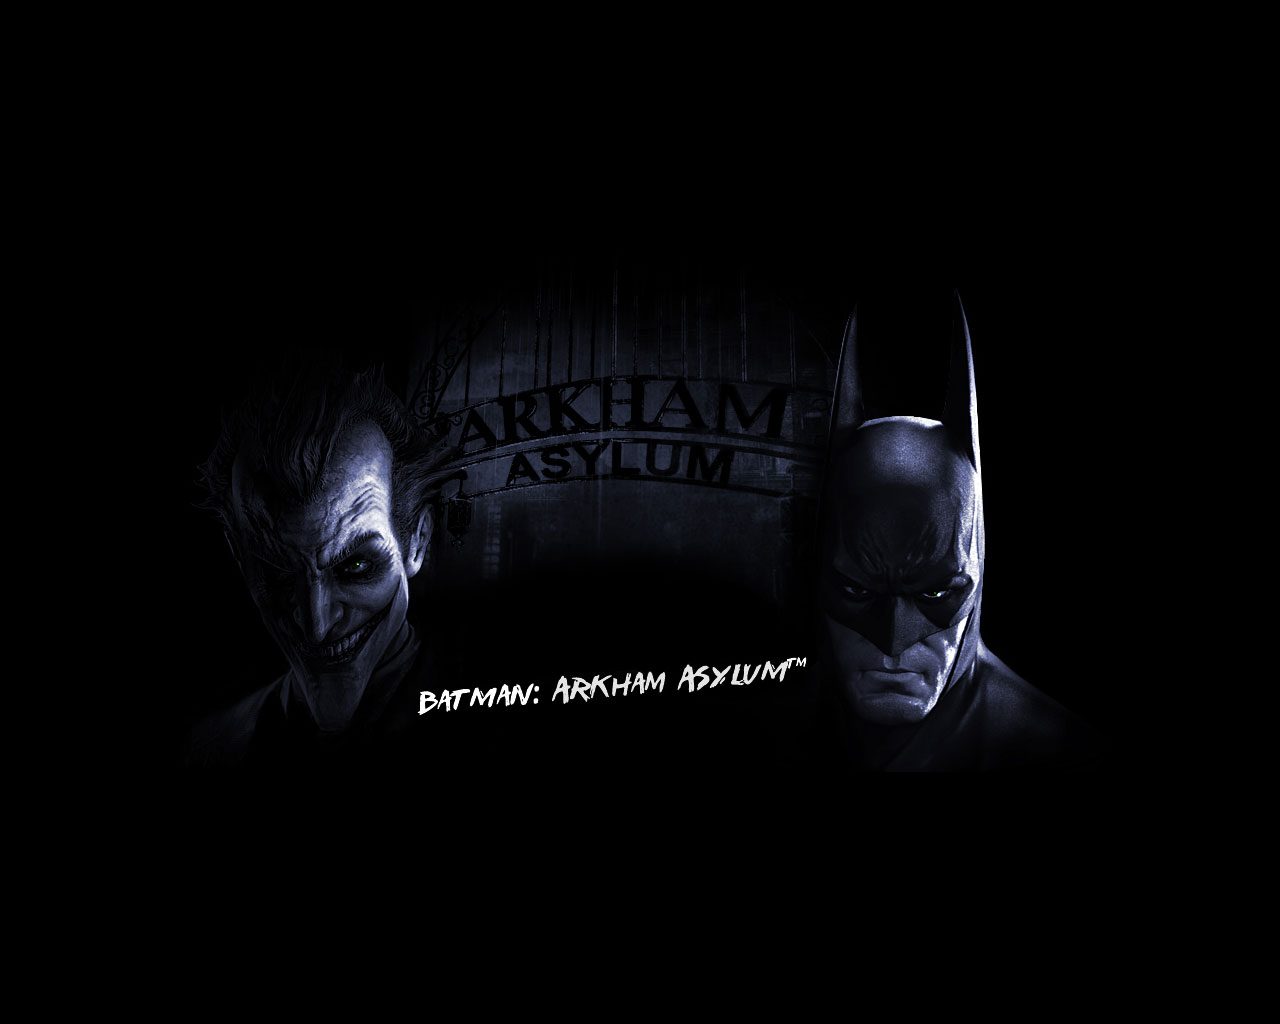 Batman Arkham Asylum Joker Wallpapers 5919 Hd Wallpapers in Games 1280x1024